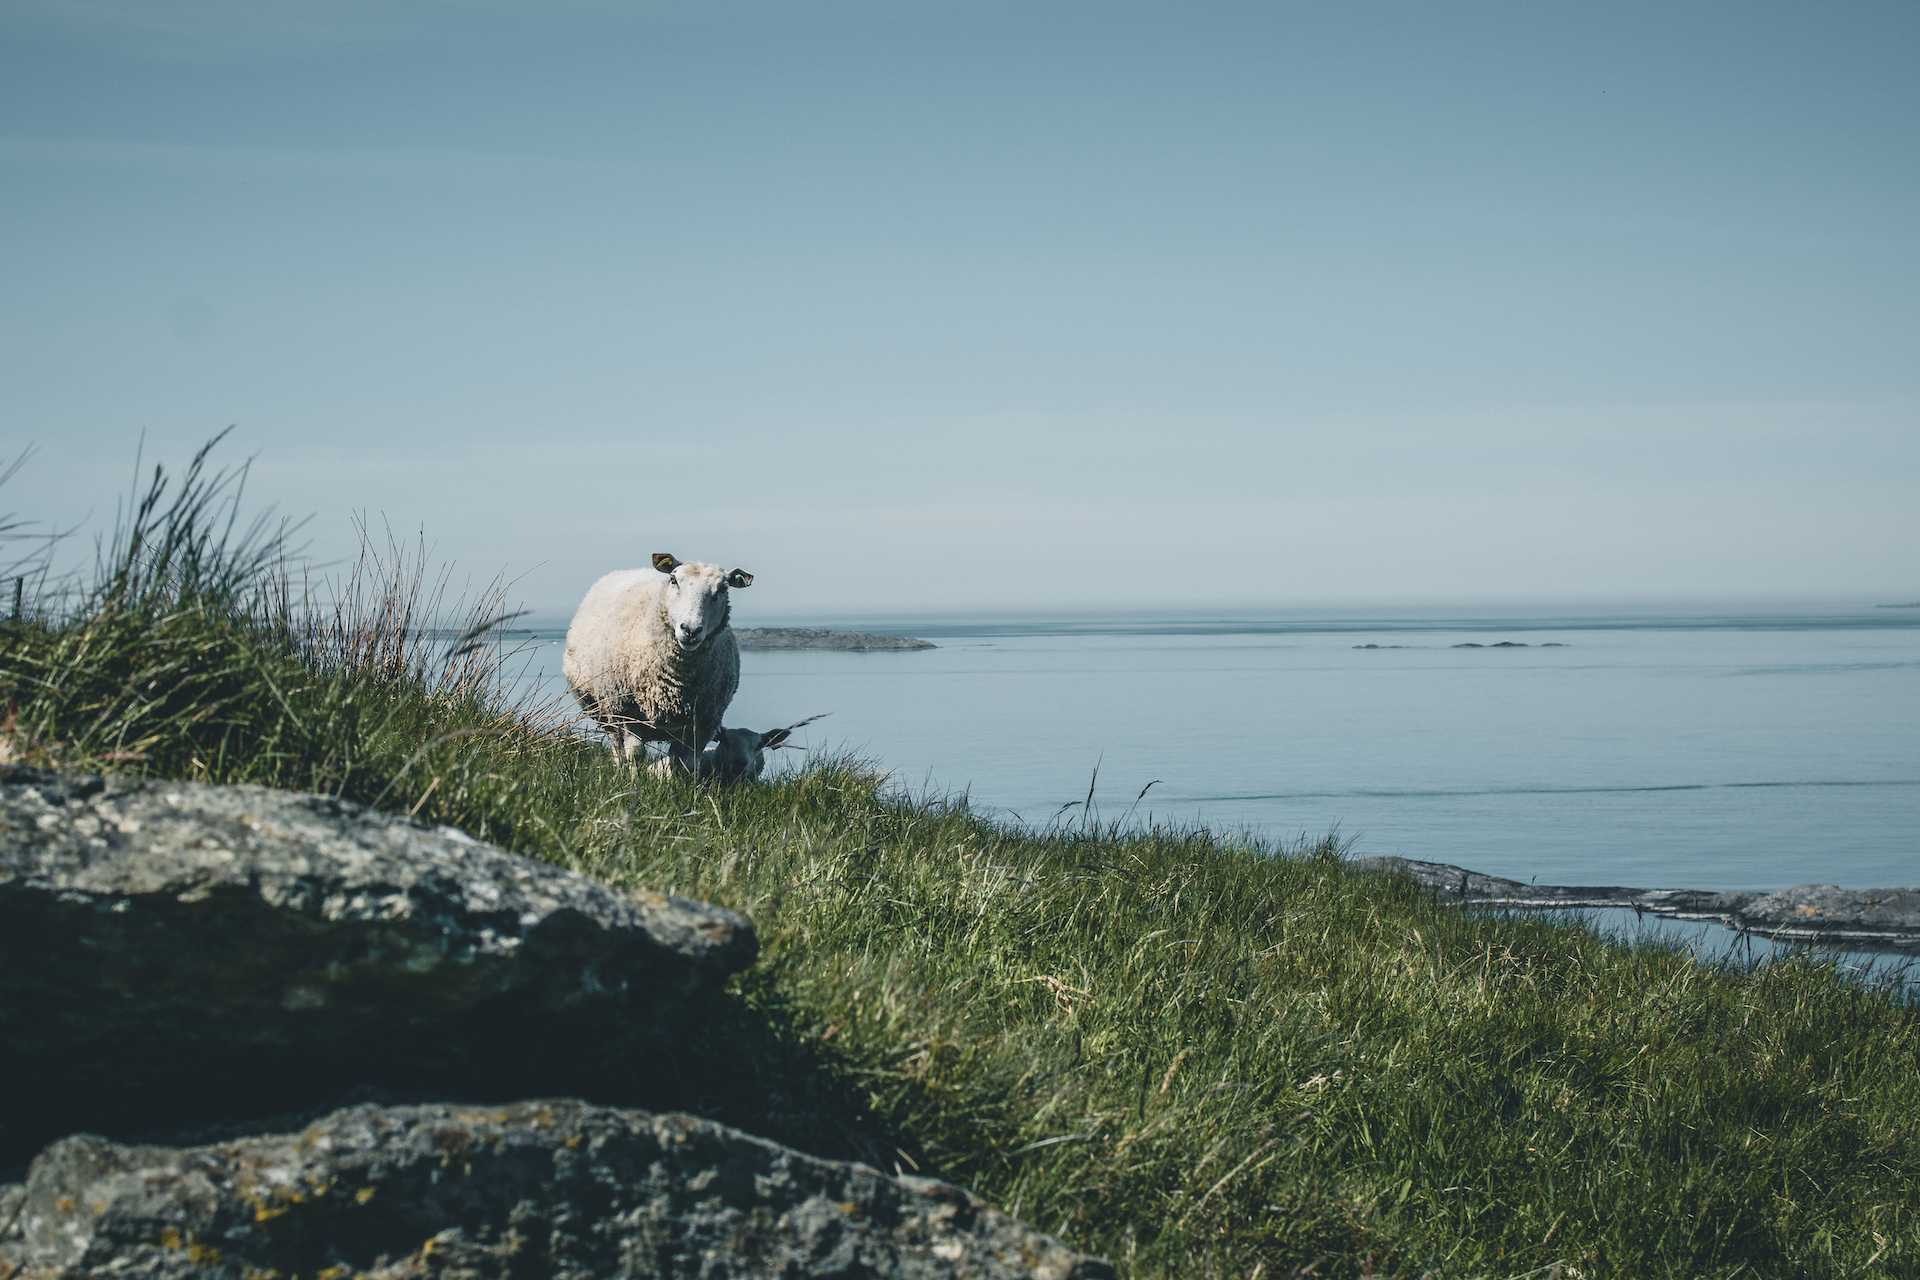 owce napołudniu Norwegii